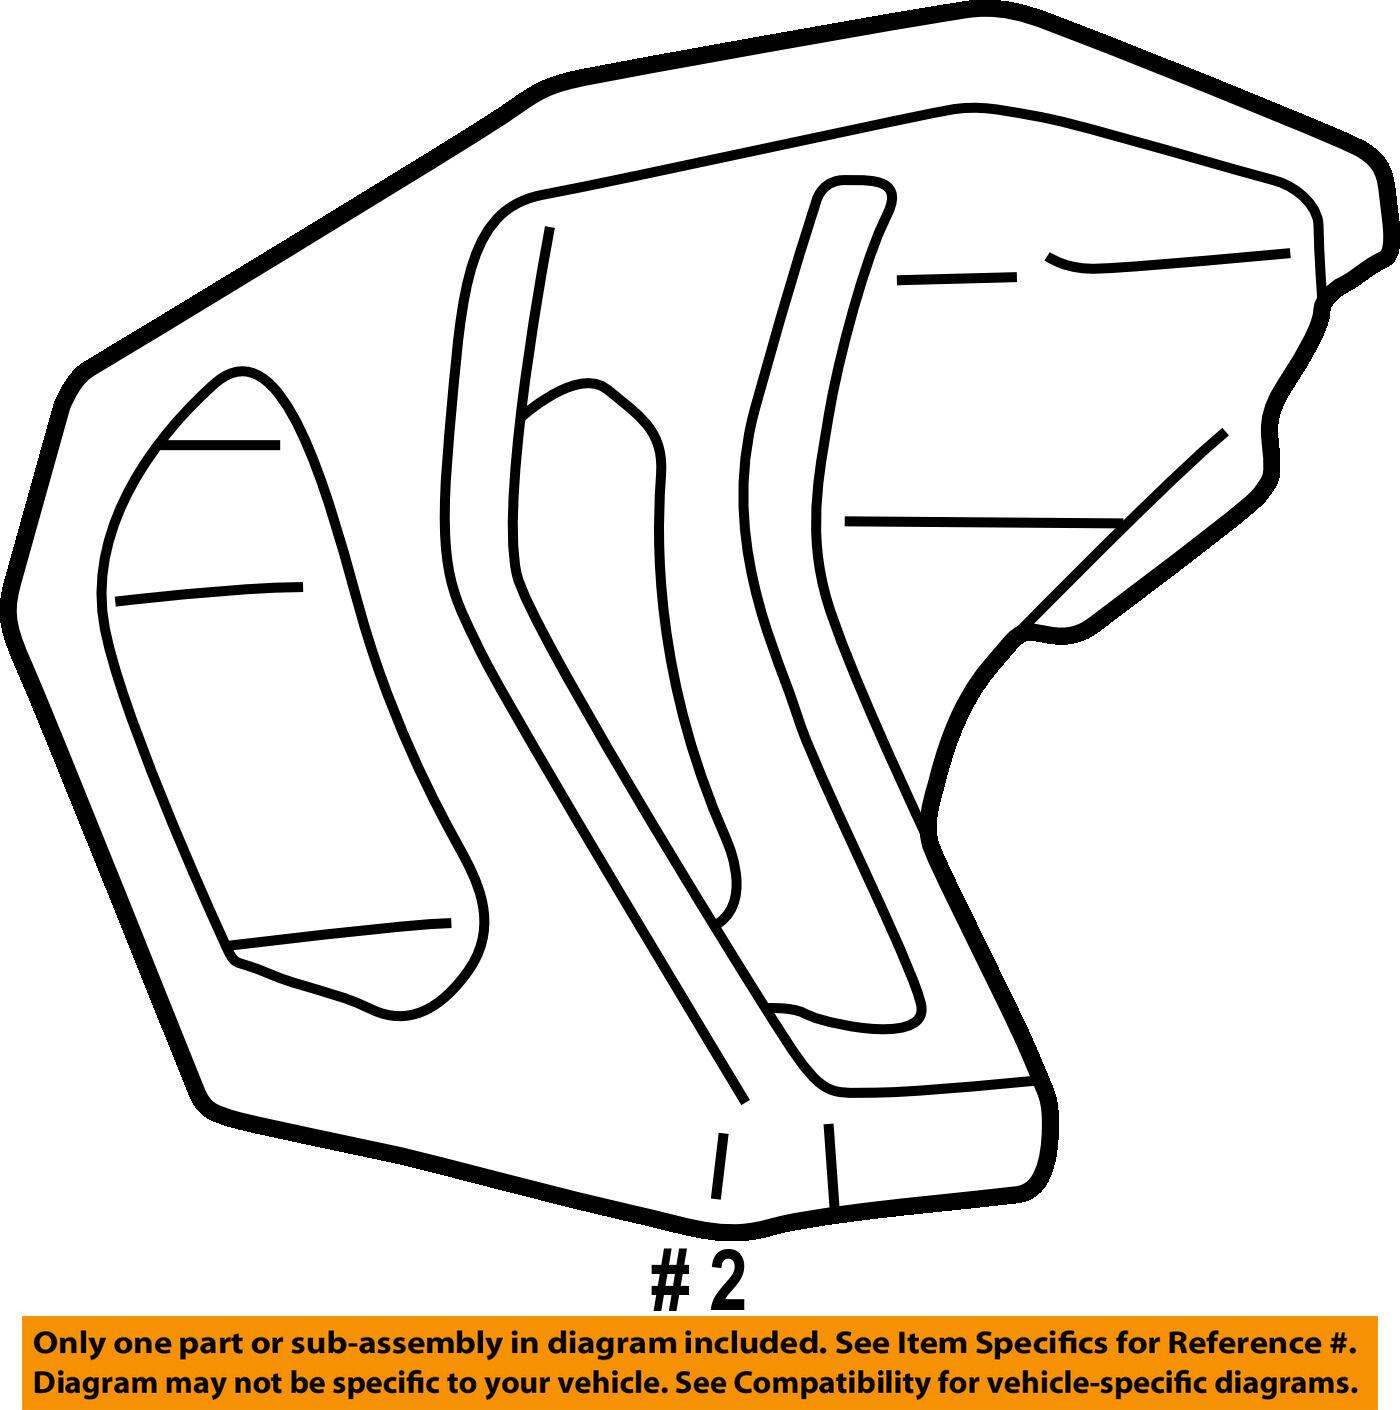 1997 2004 gm corvette c5 gto ls1 or ls6 rh engine mount support C5 Corvette Cooling Diagram 1997 2004 gm corvette c5 gto ls1 or ls6 rh engine mount support bracket ebay